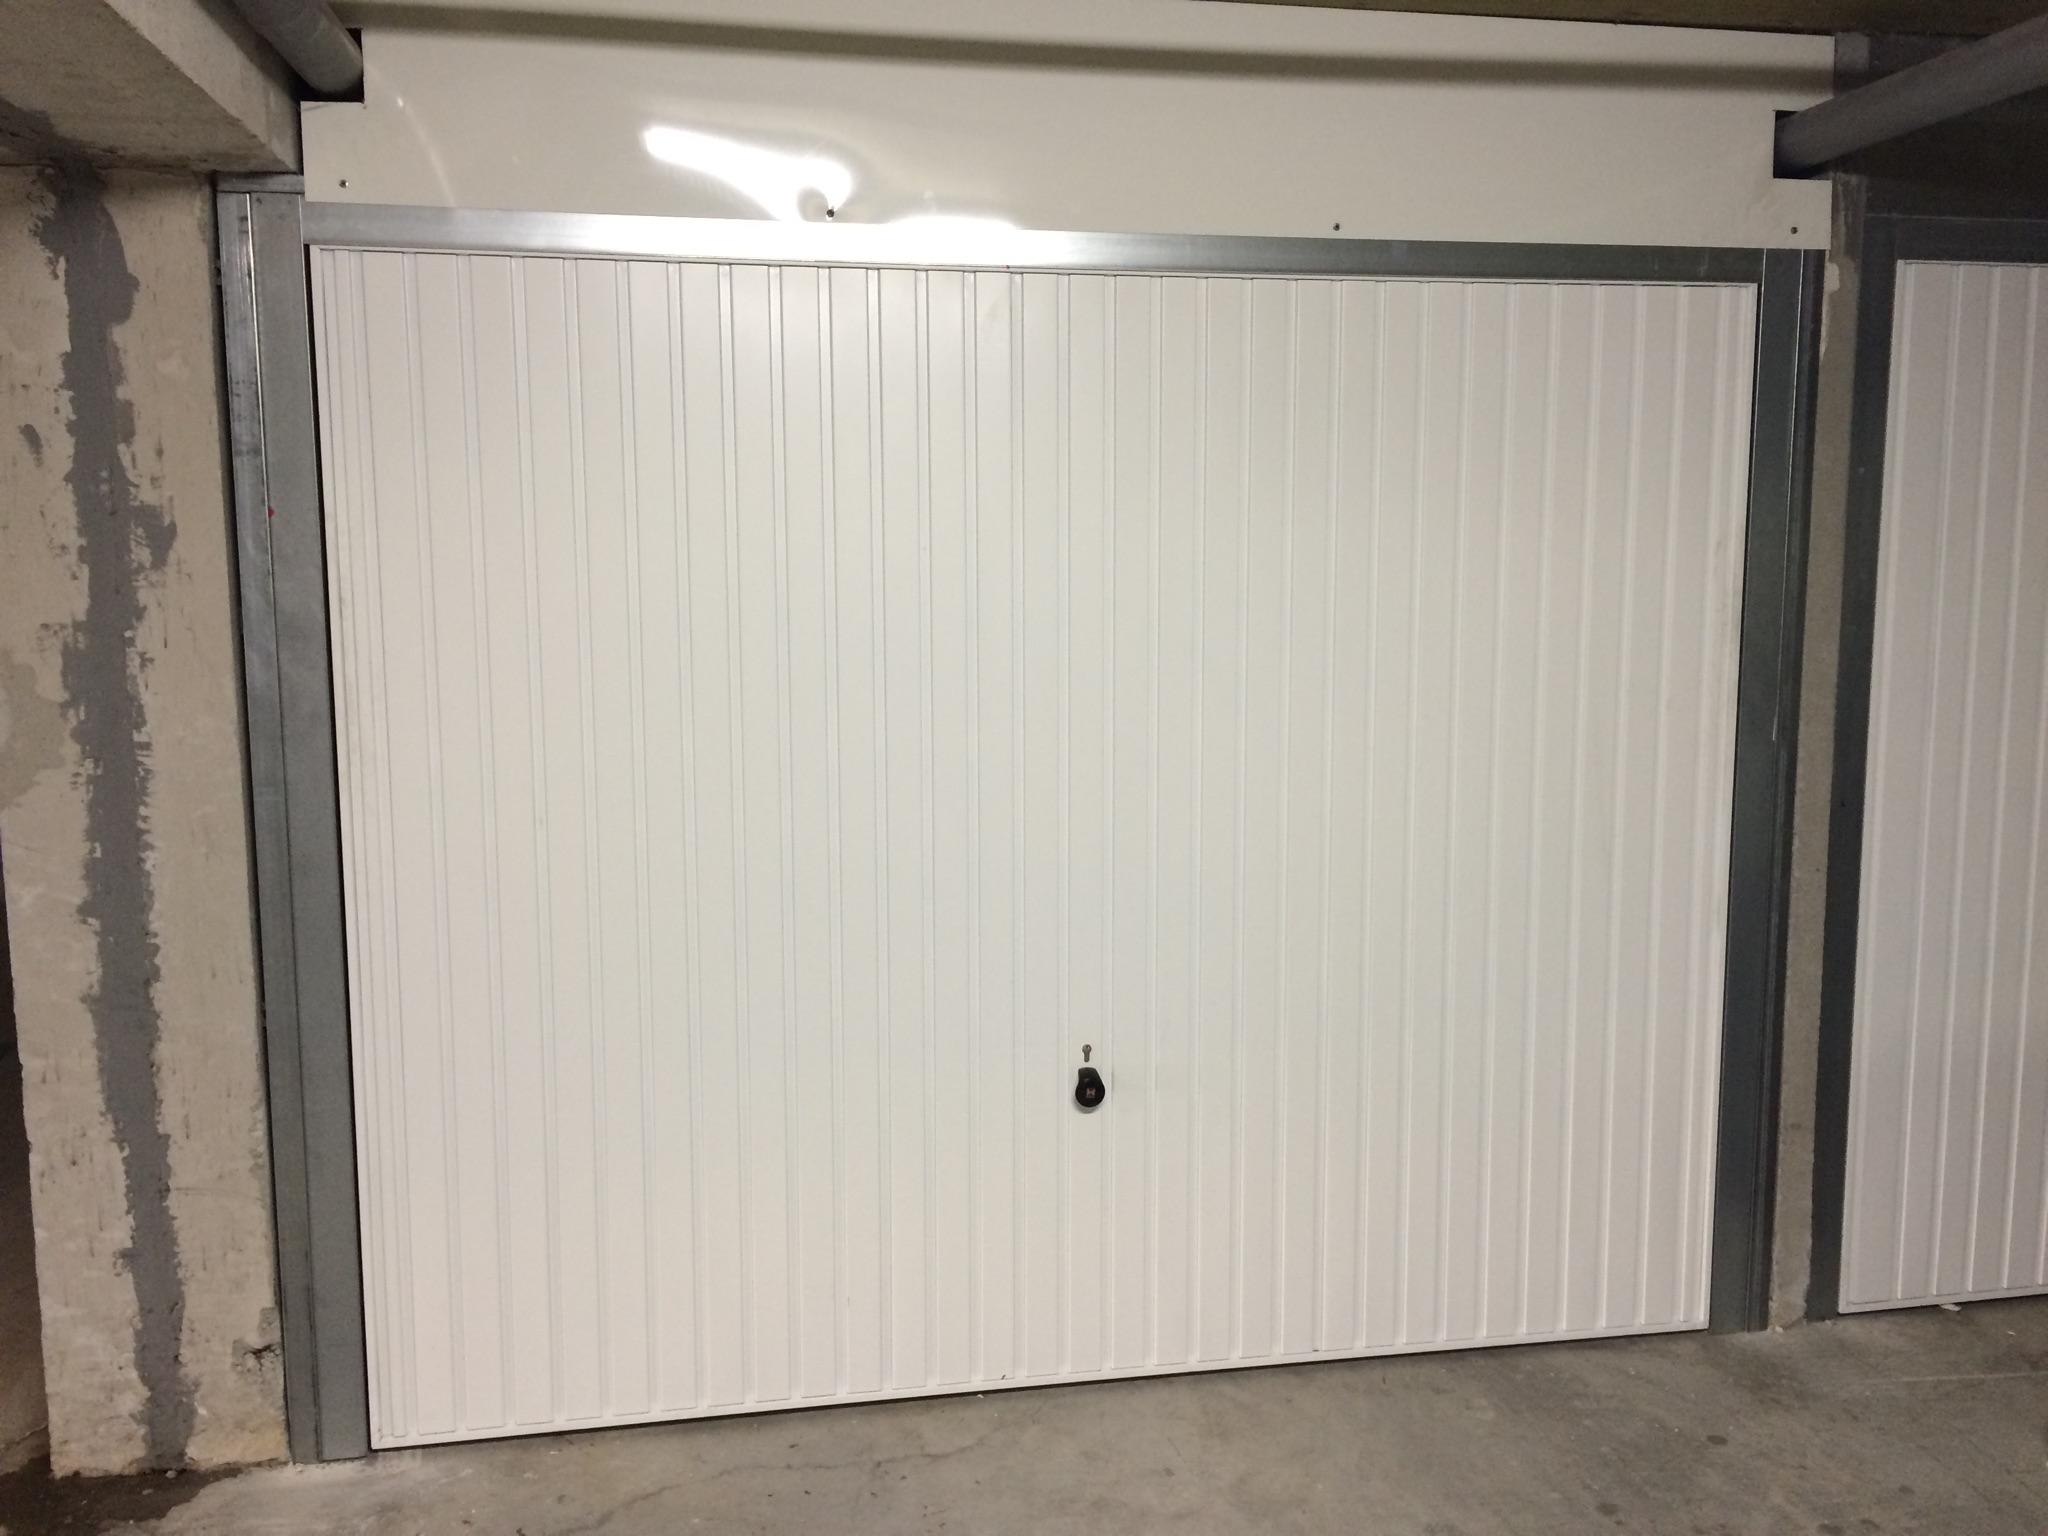 fabriquer porte de garage basculante isolation id es. Black Bedroom Furniture Sets. Home Design Ideas